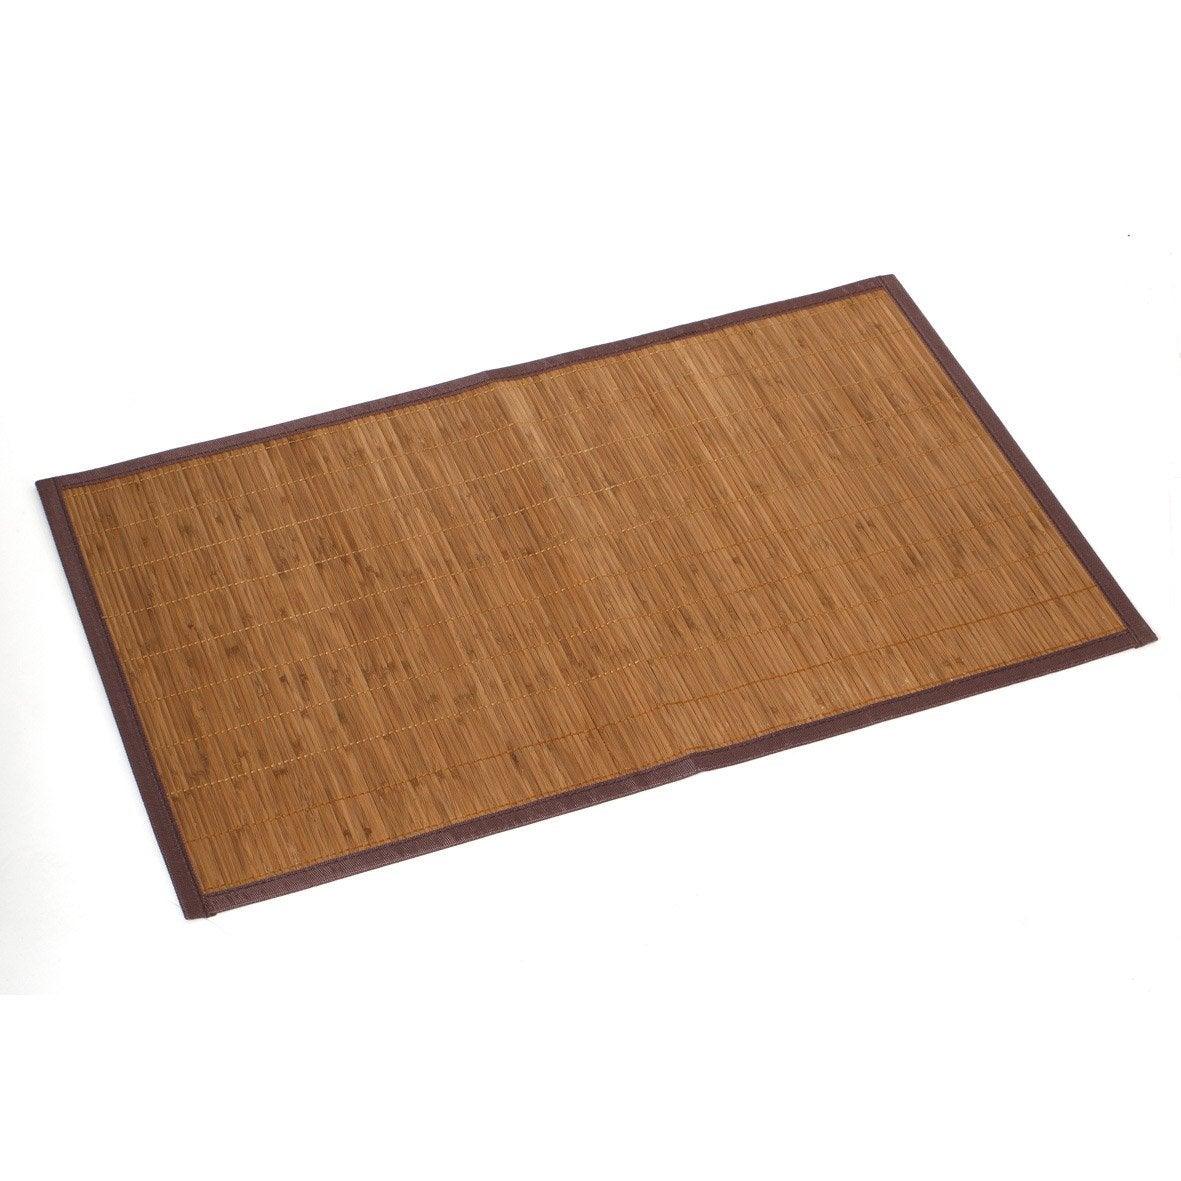 Tapis de bain l.80 x L.50 cm, Bambou